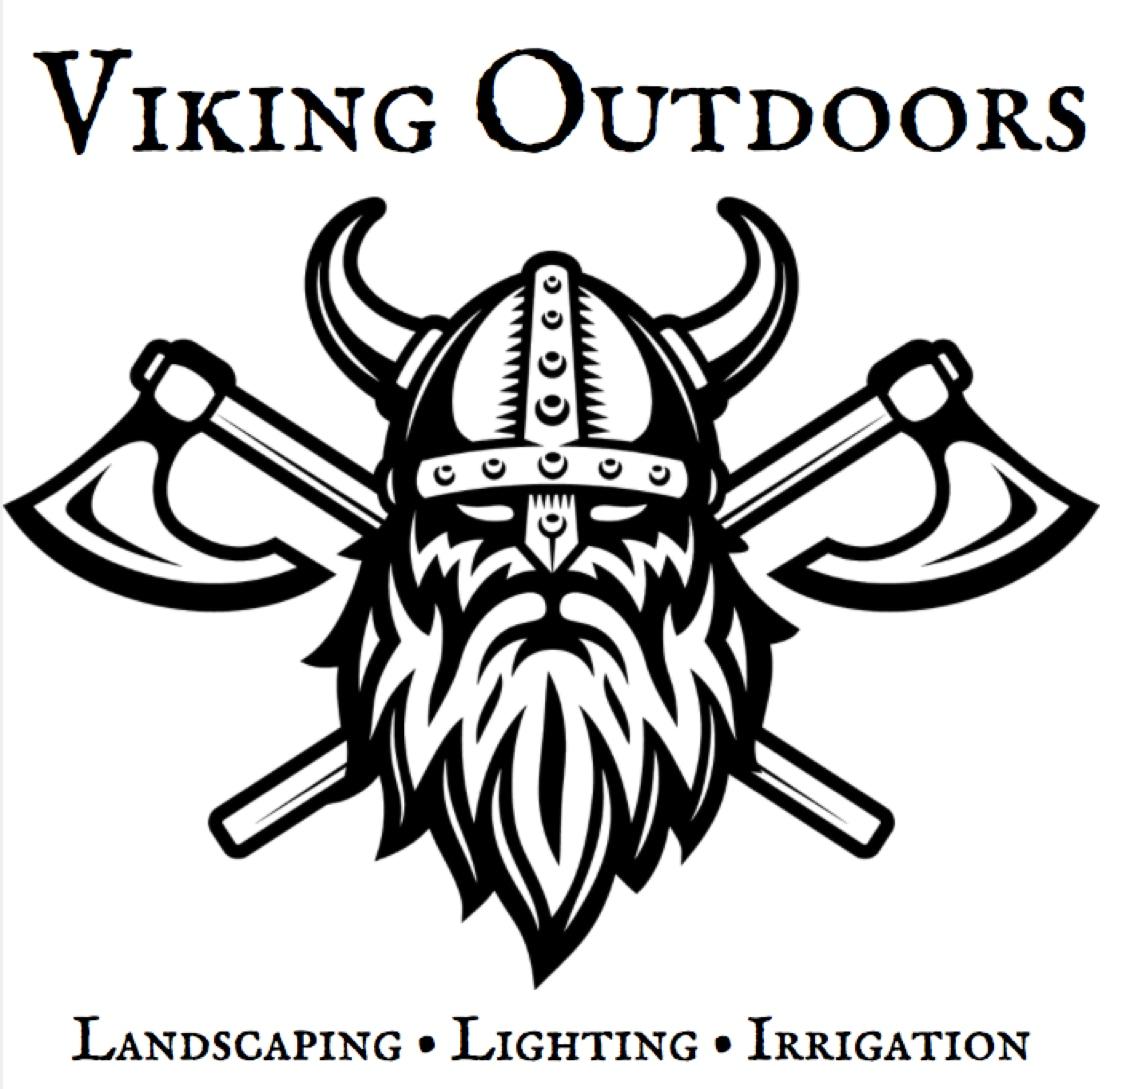 Viking Outdoors